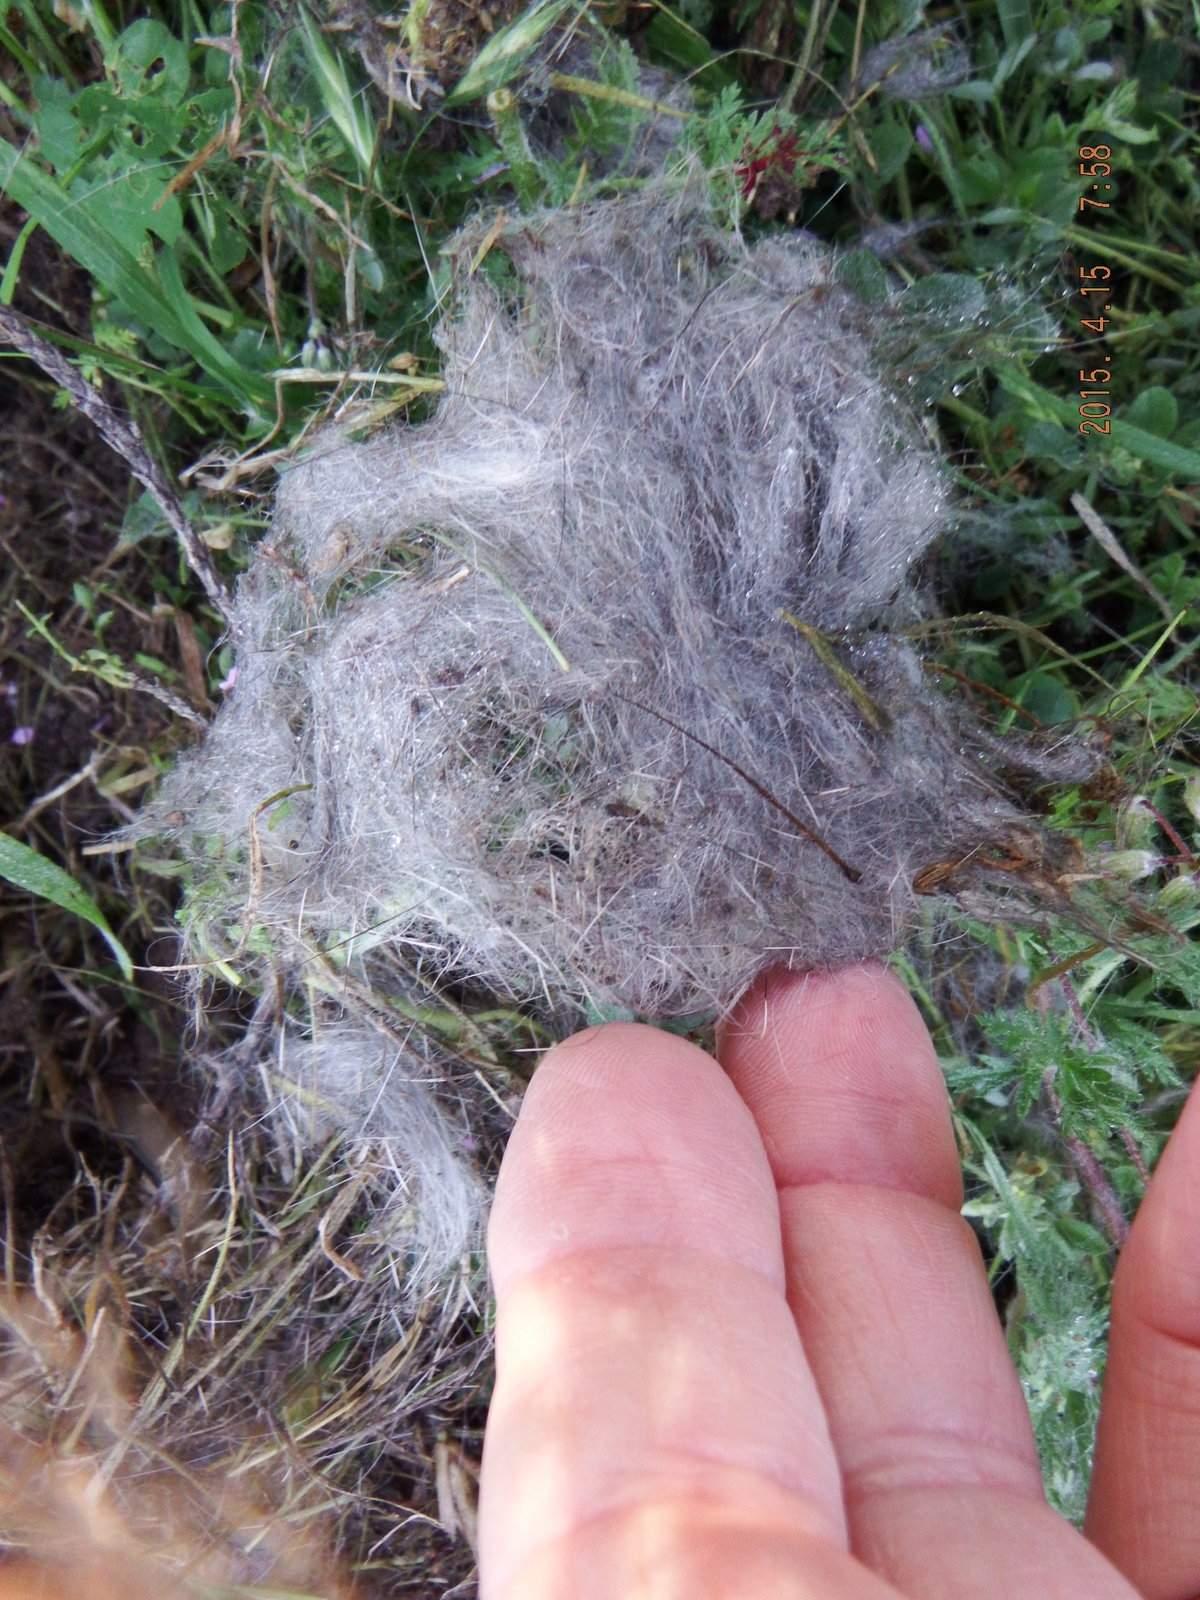 Rabbit Nest in the Grass 3.JPG